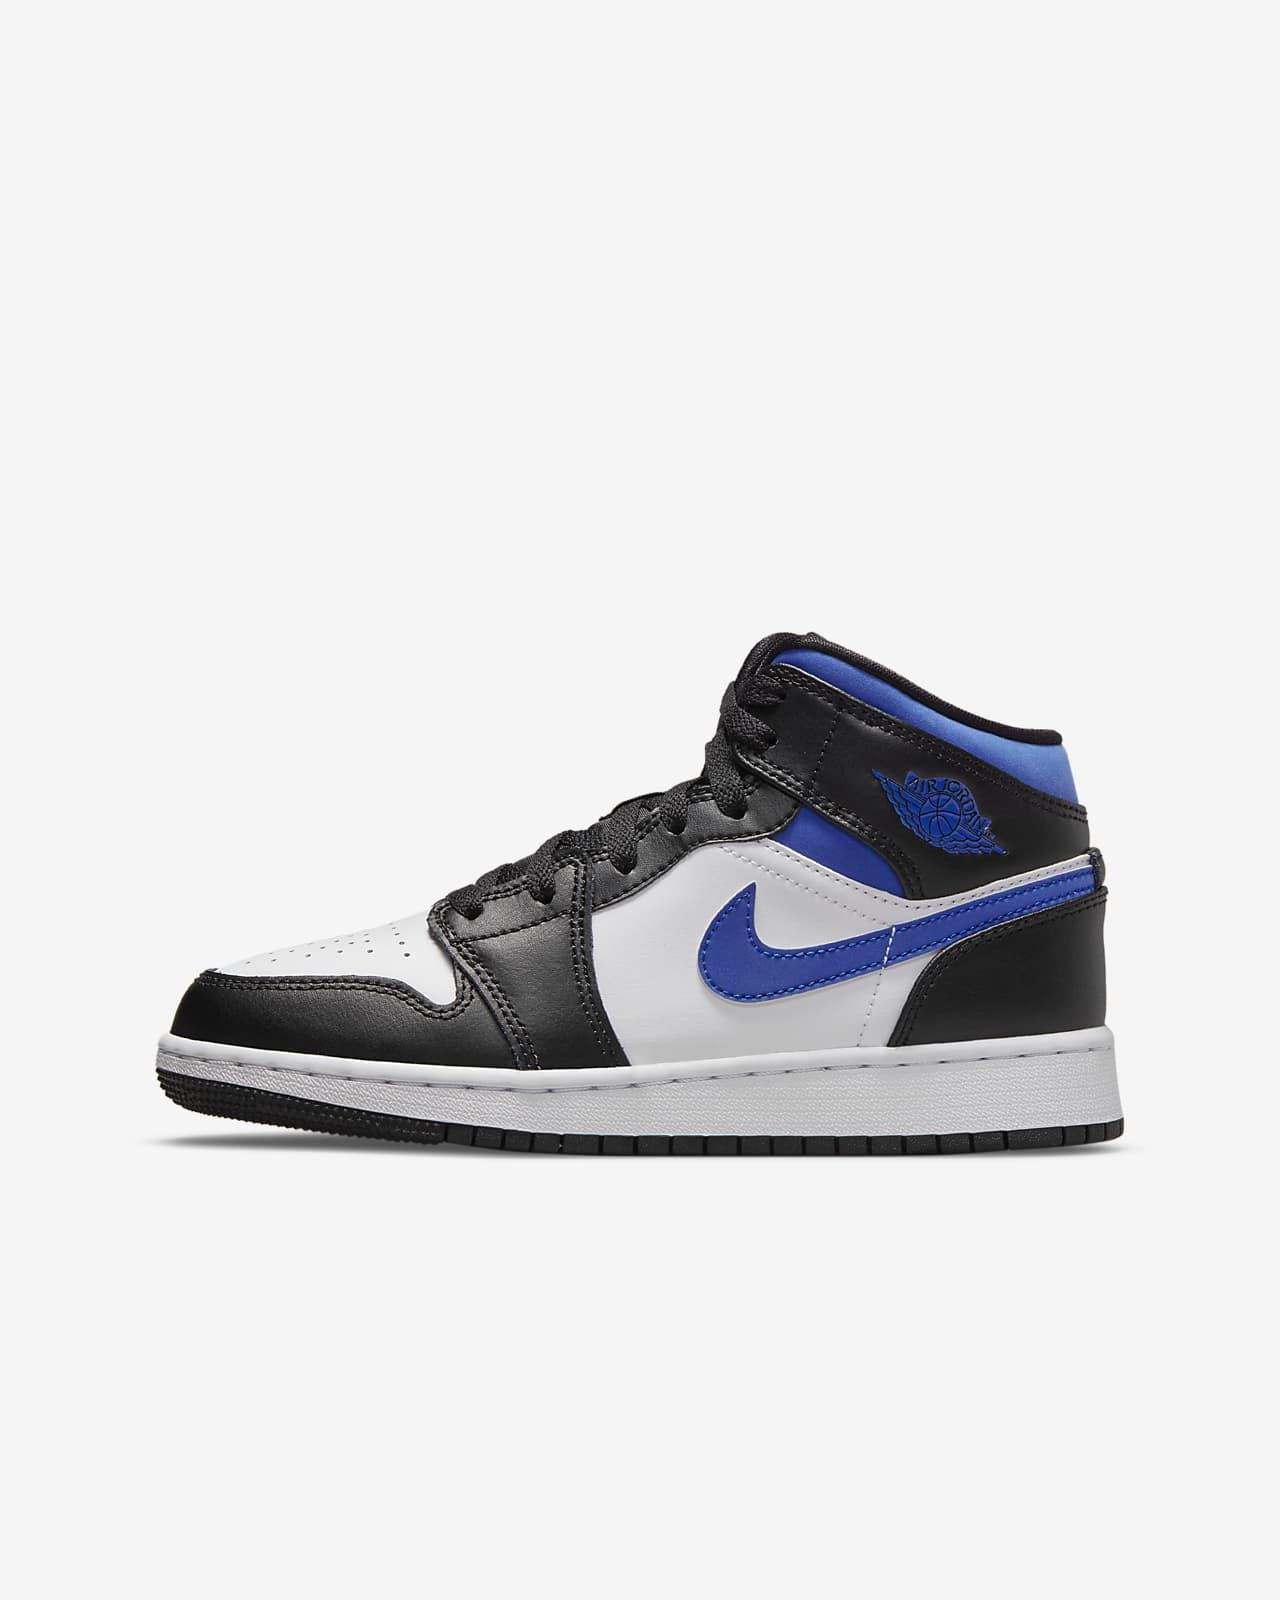 Air Jordan 1 中筒大童鞋款